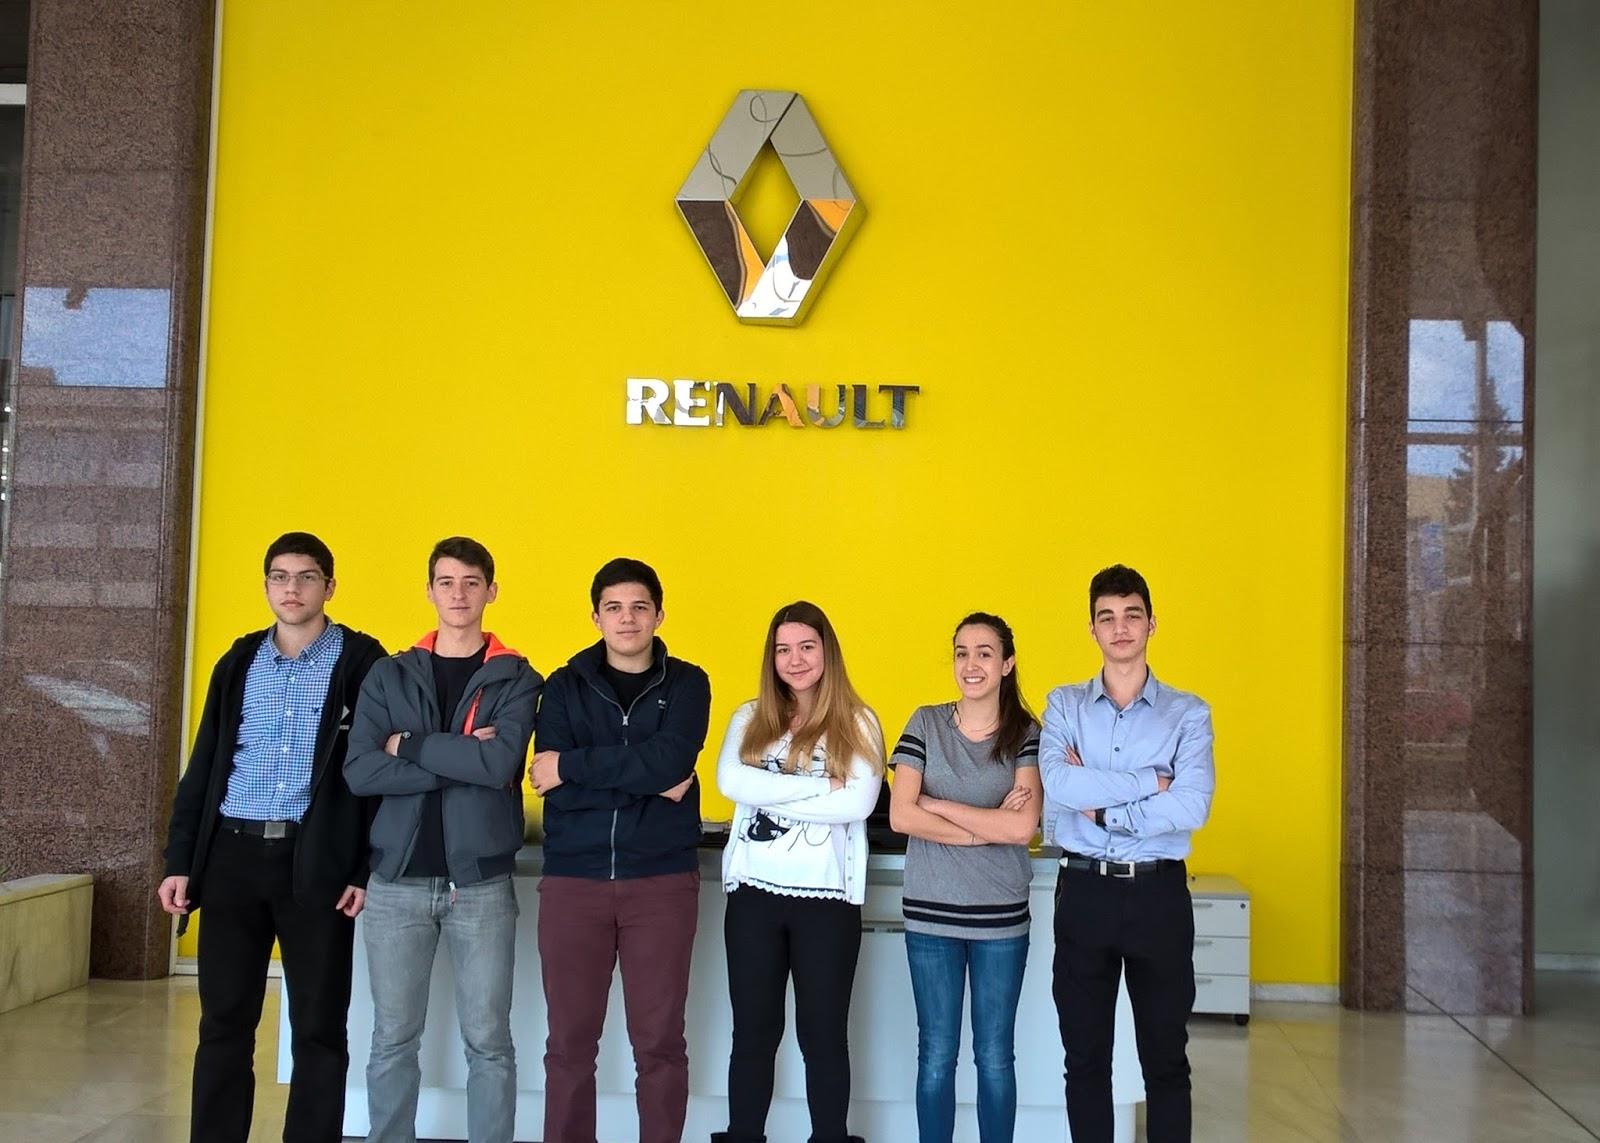 sciron2Bteam Μαθητές απ' όλο τον κόσμο δημιουργούν τις δικές τους ομάδες στα πρότυπα της F1 F1, Renault, videos, Τεχνολογία